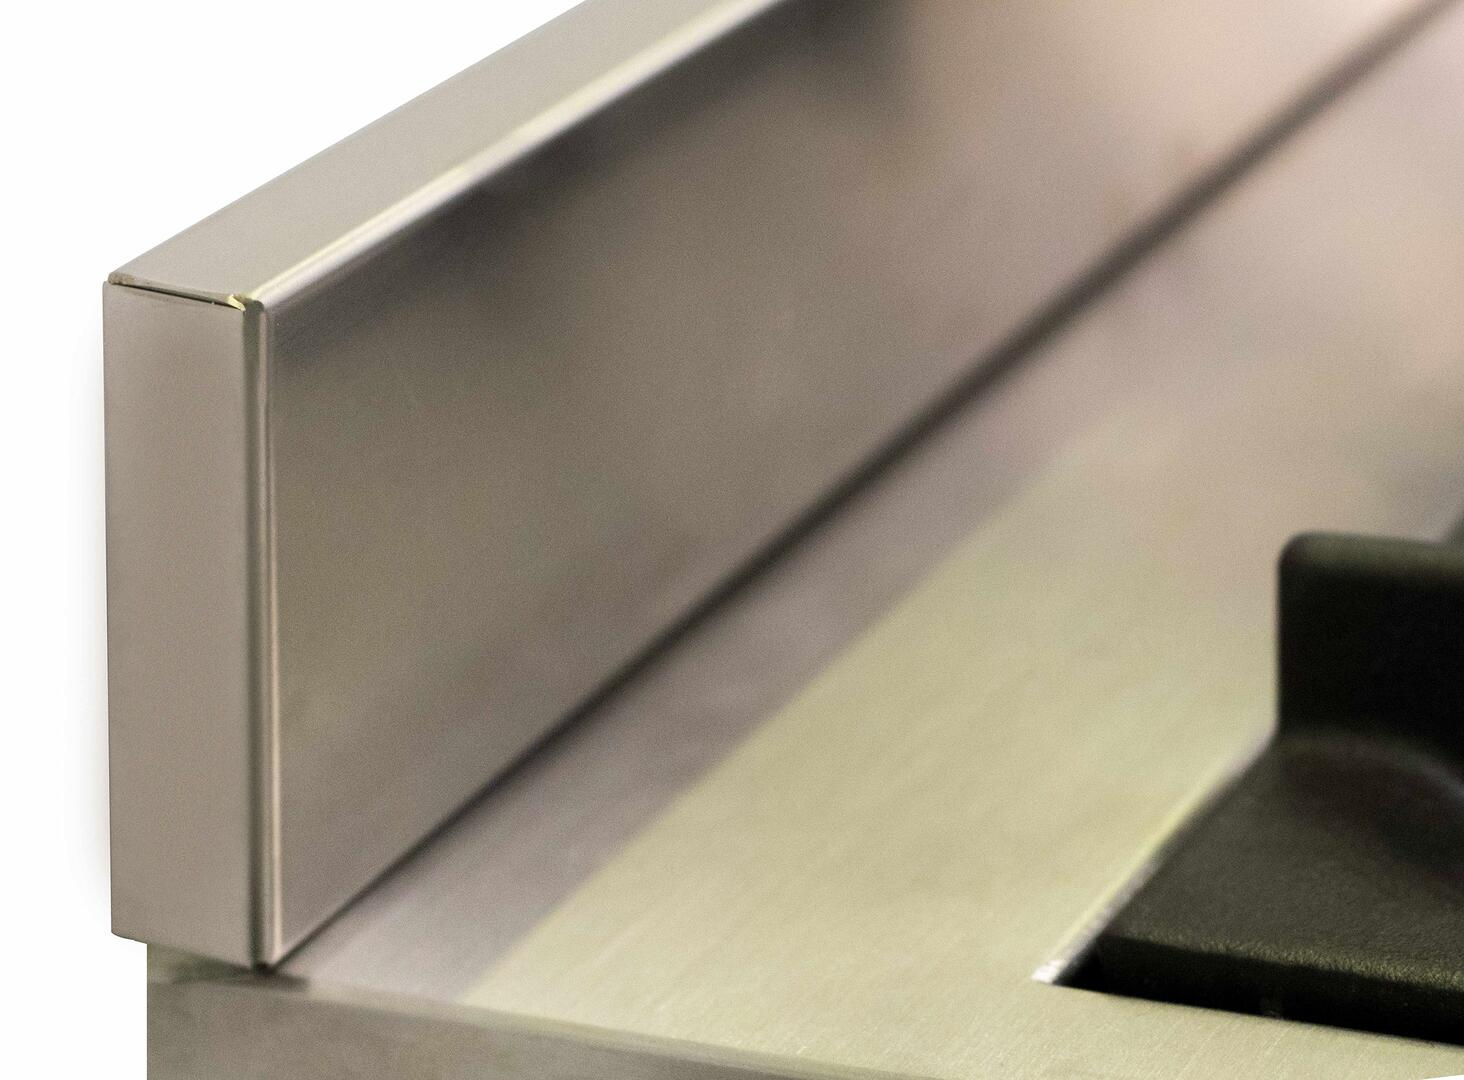 Ilve Majestic II UMD10FDNS3SSP Freestanding Dual Fuel Range Stainless Steel, UMD10FD-Backsplash